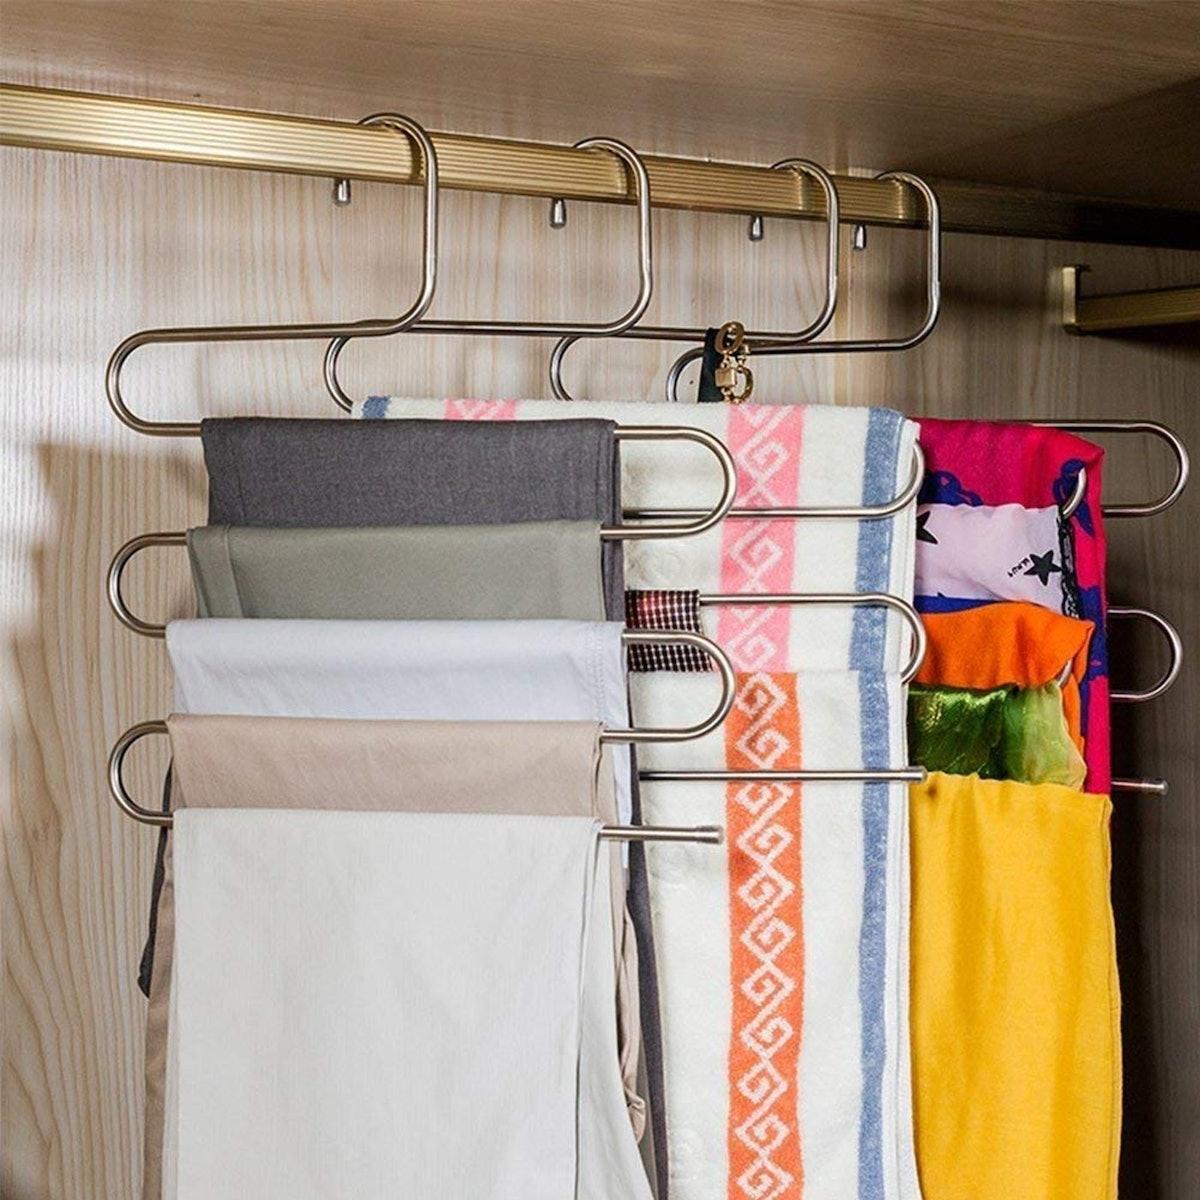 DOIOWN Pants Hangers